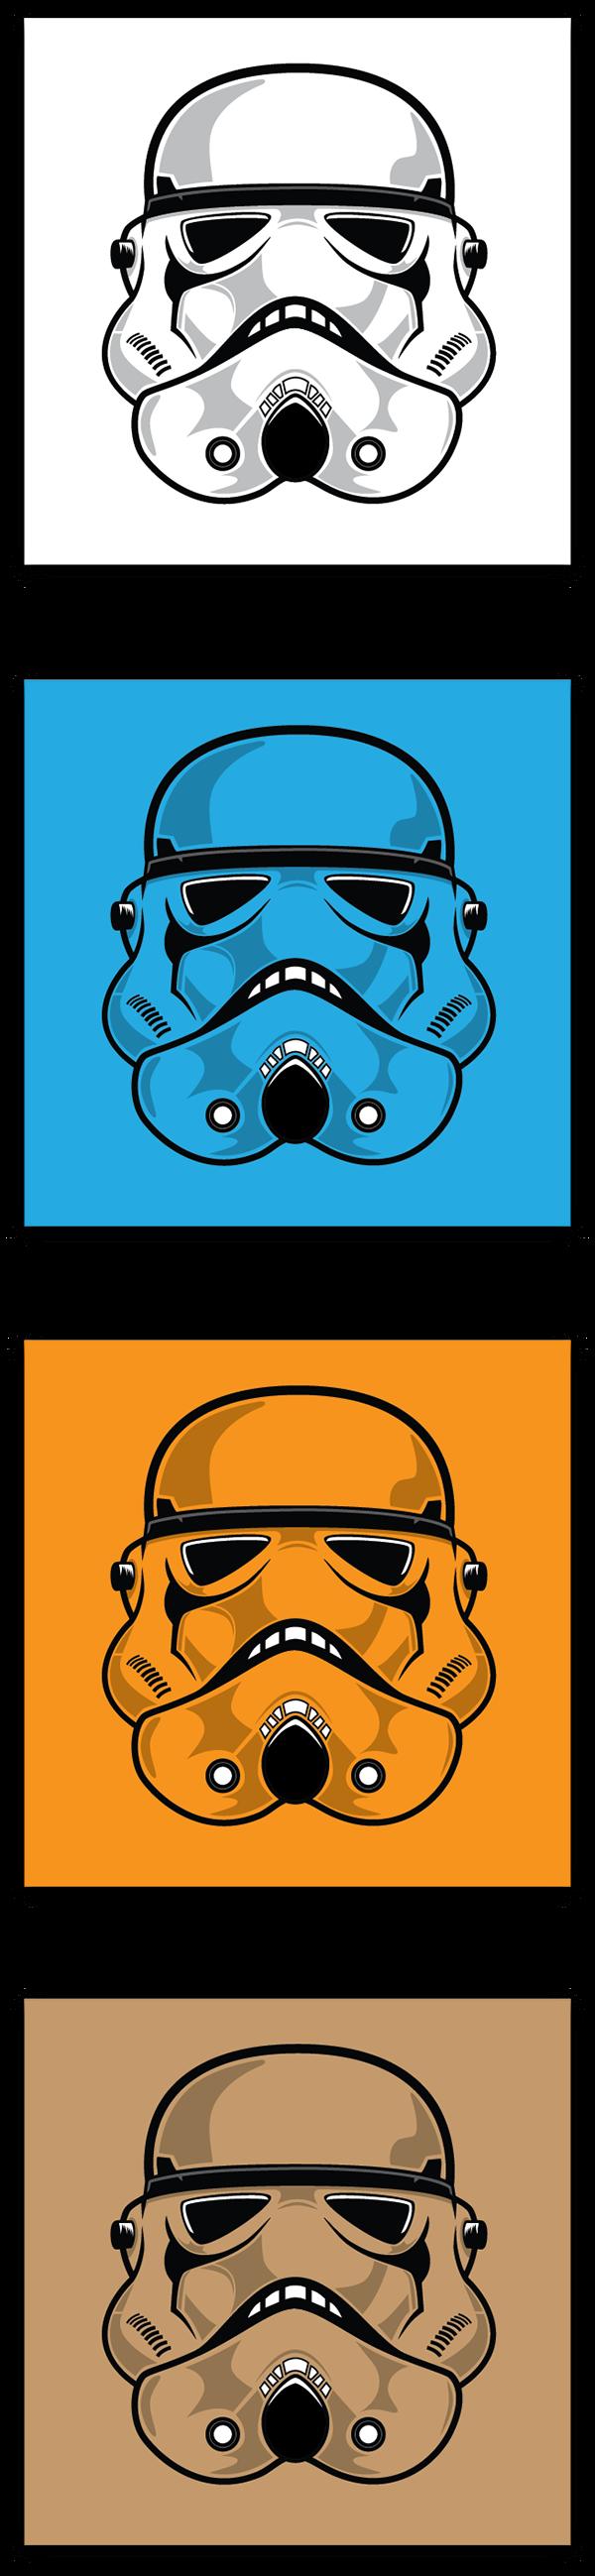 stormtrooper storm trooper storm Trooper color color storm